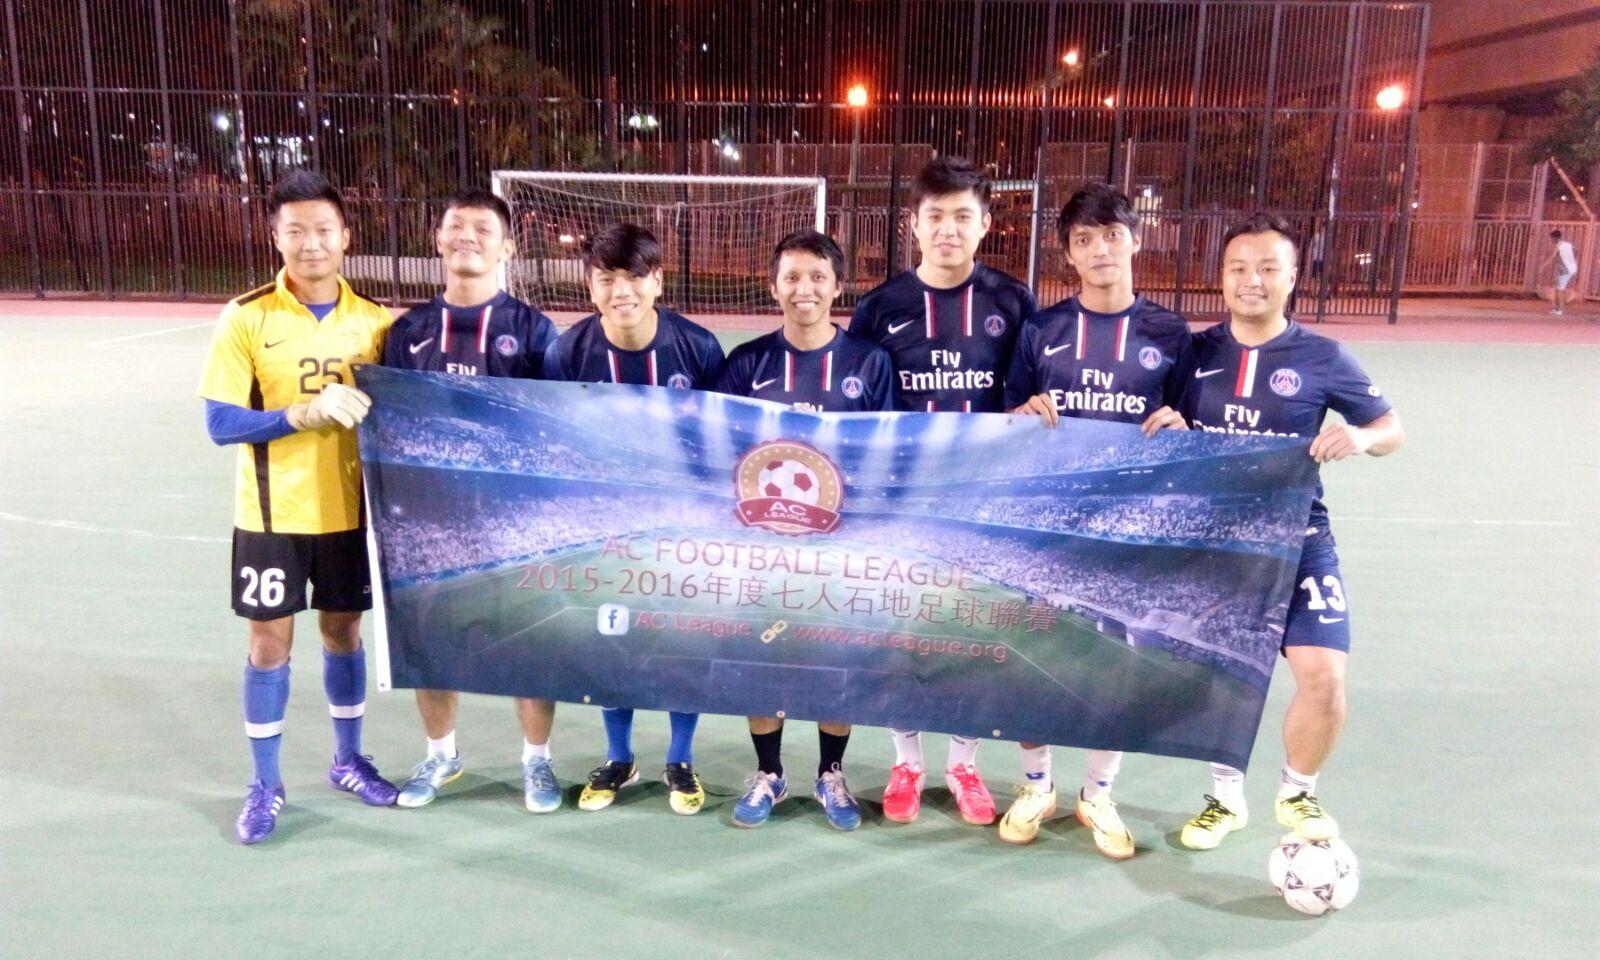 87 united